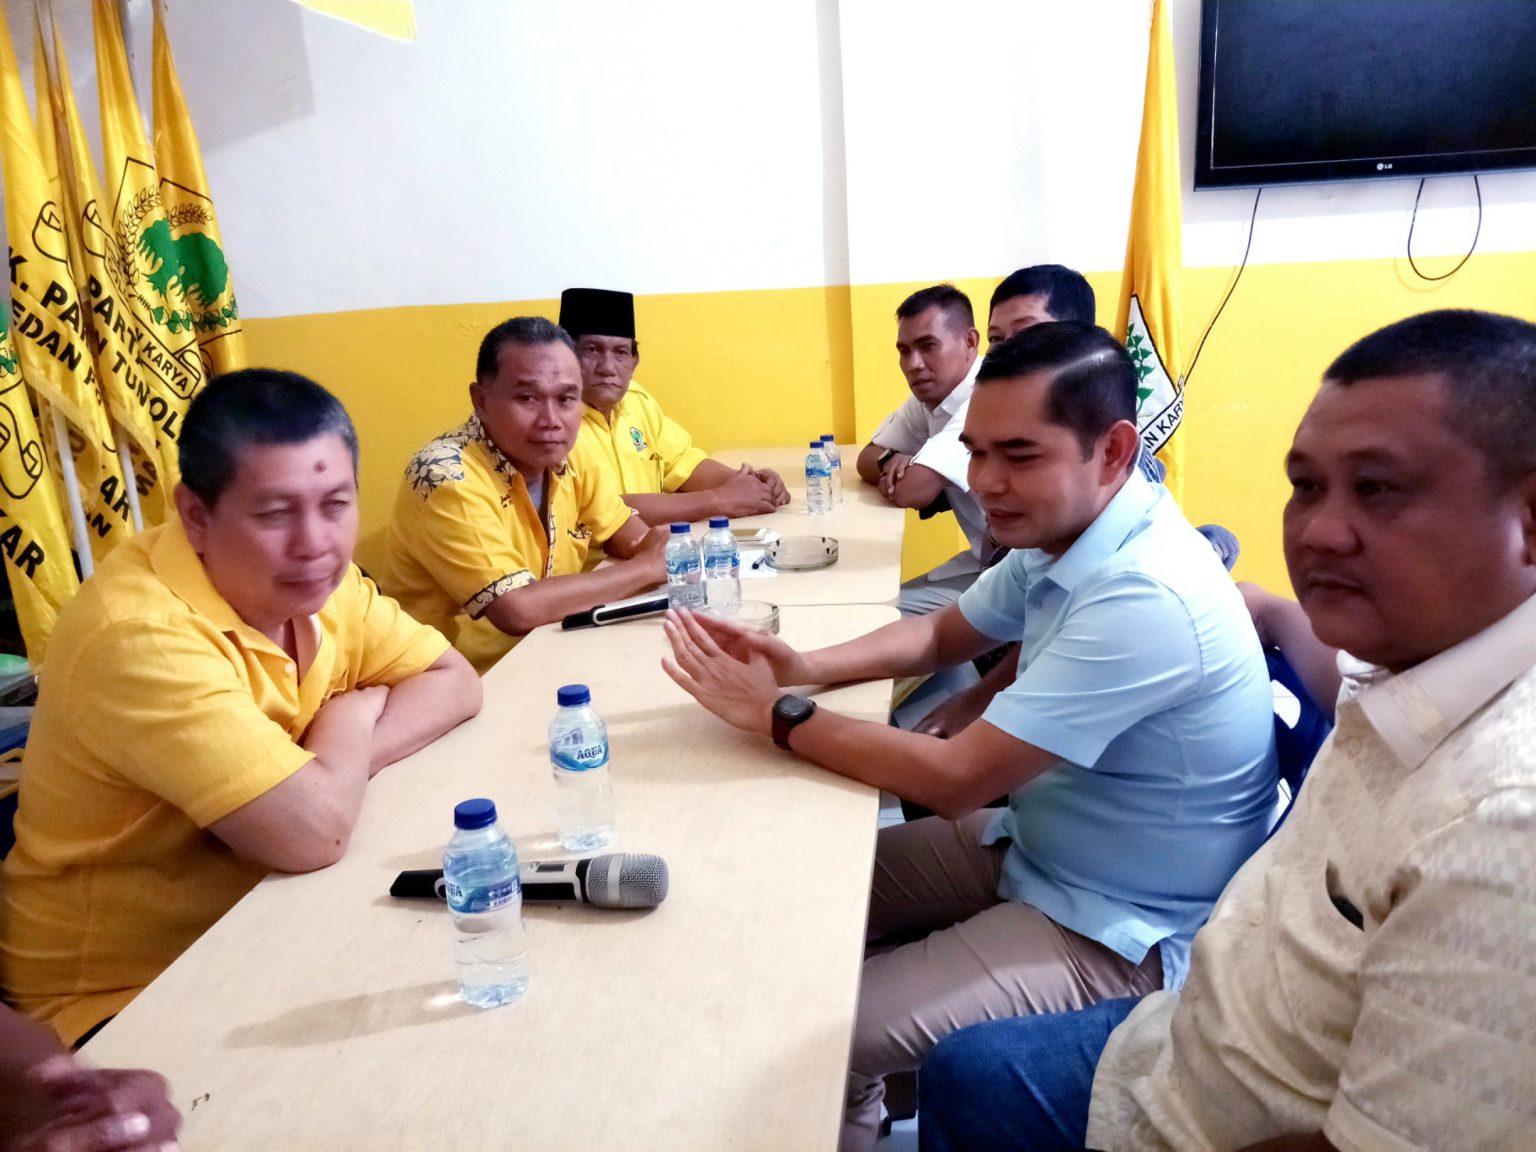 Syaf Lubis Puji Kualitas Ihwan Ritonga Untuk Jadi Walikota Medan